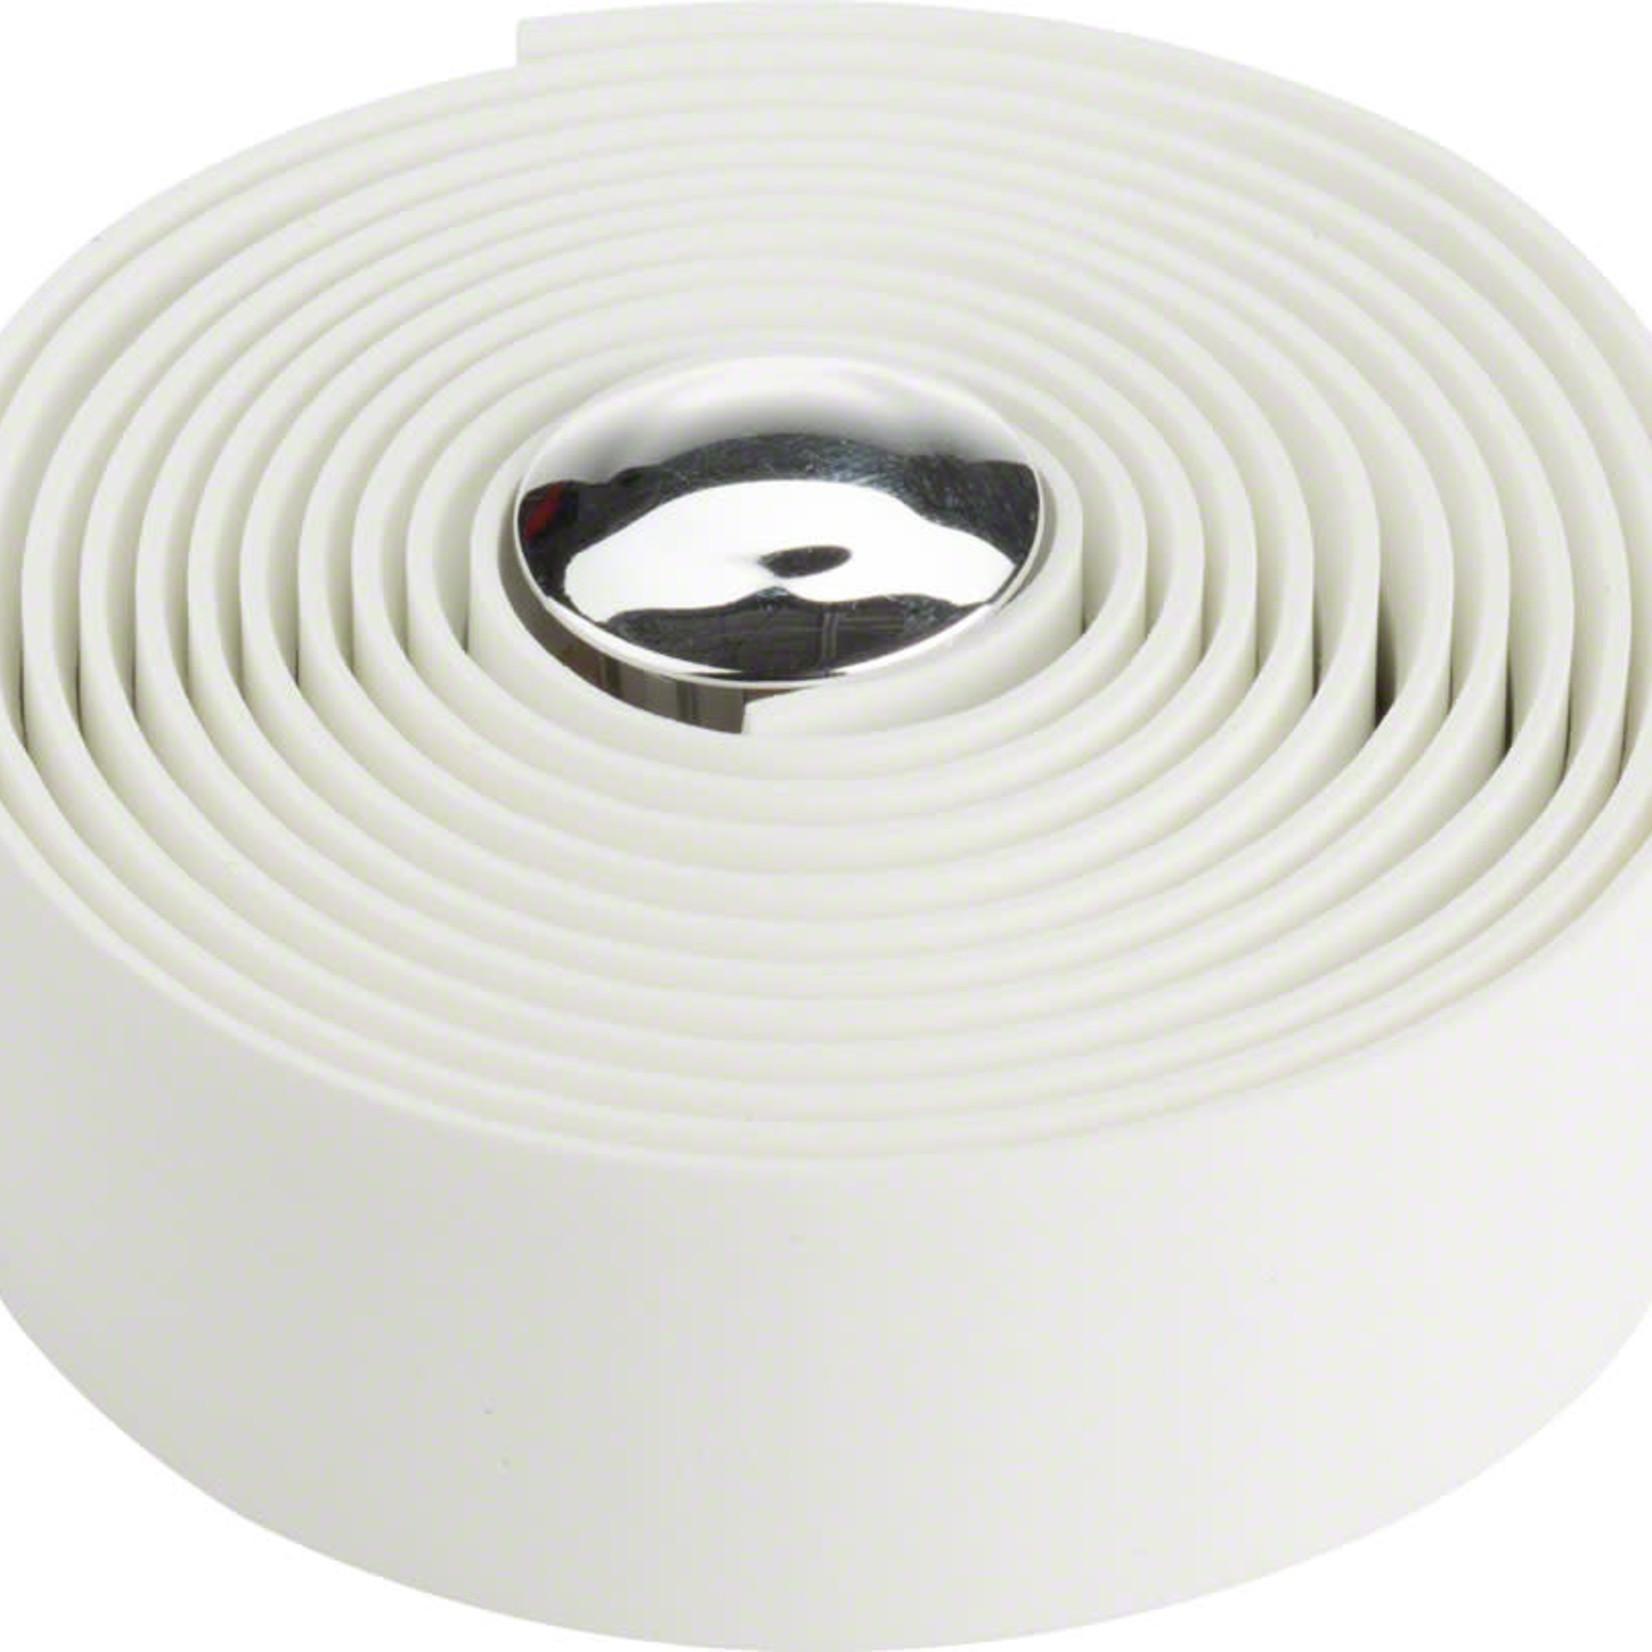 EVA Handlebar Tape White